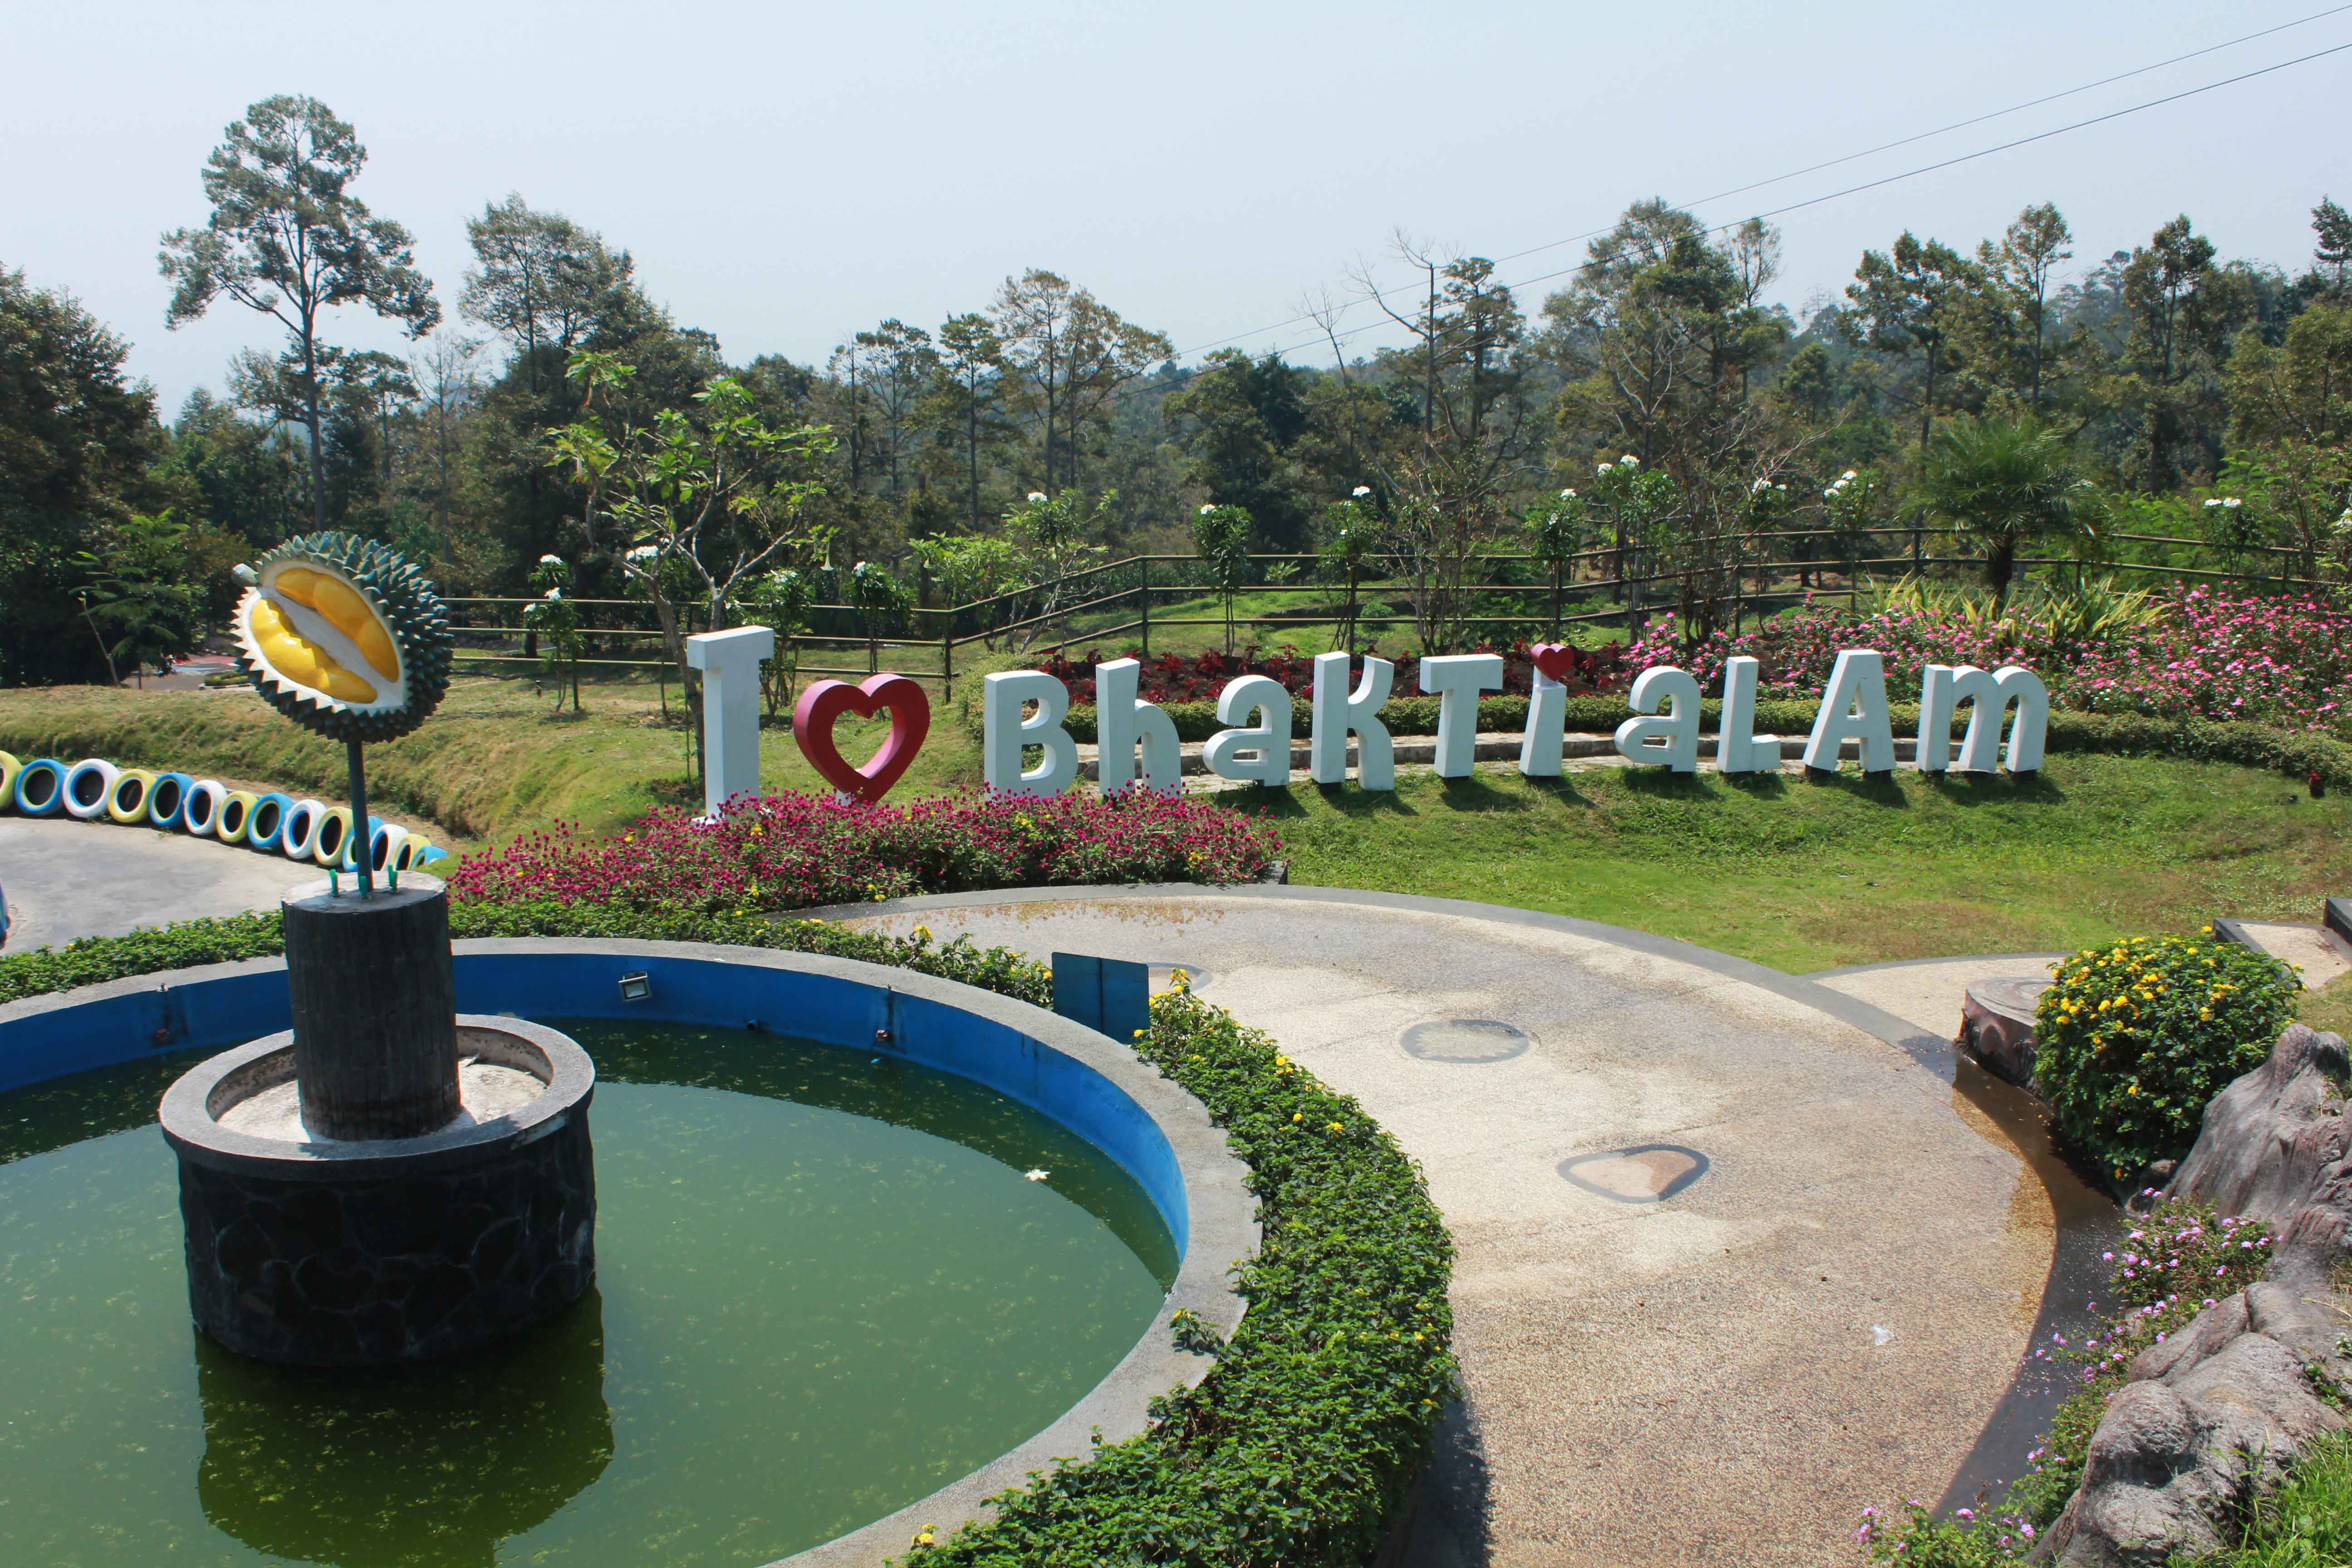 Wisata Agro Bhakti Alam Blog Museum Online Kabupaten Pasuruan Bukit